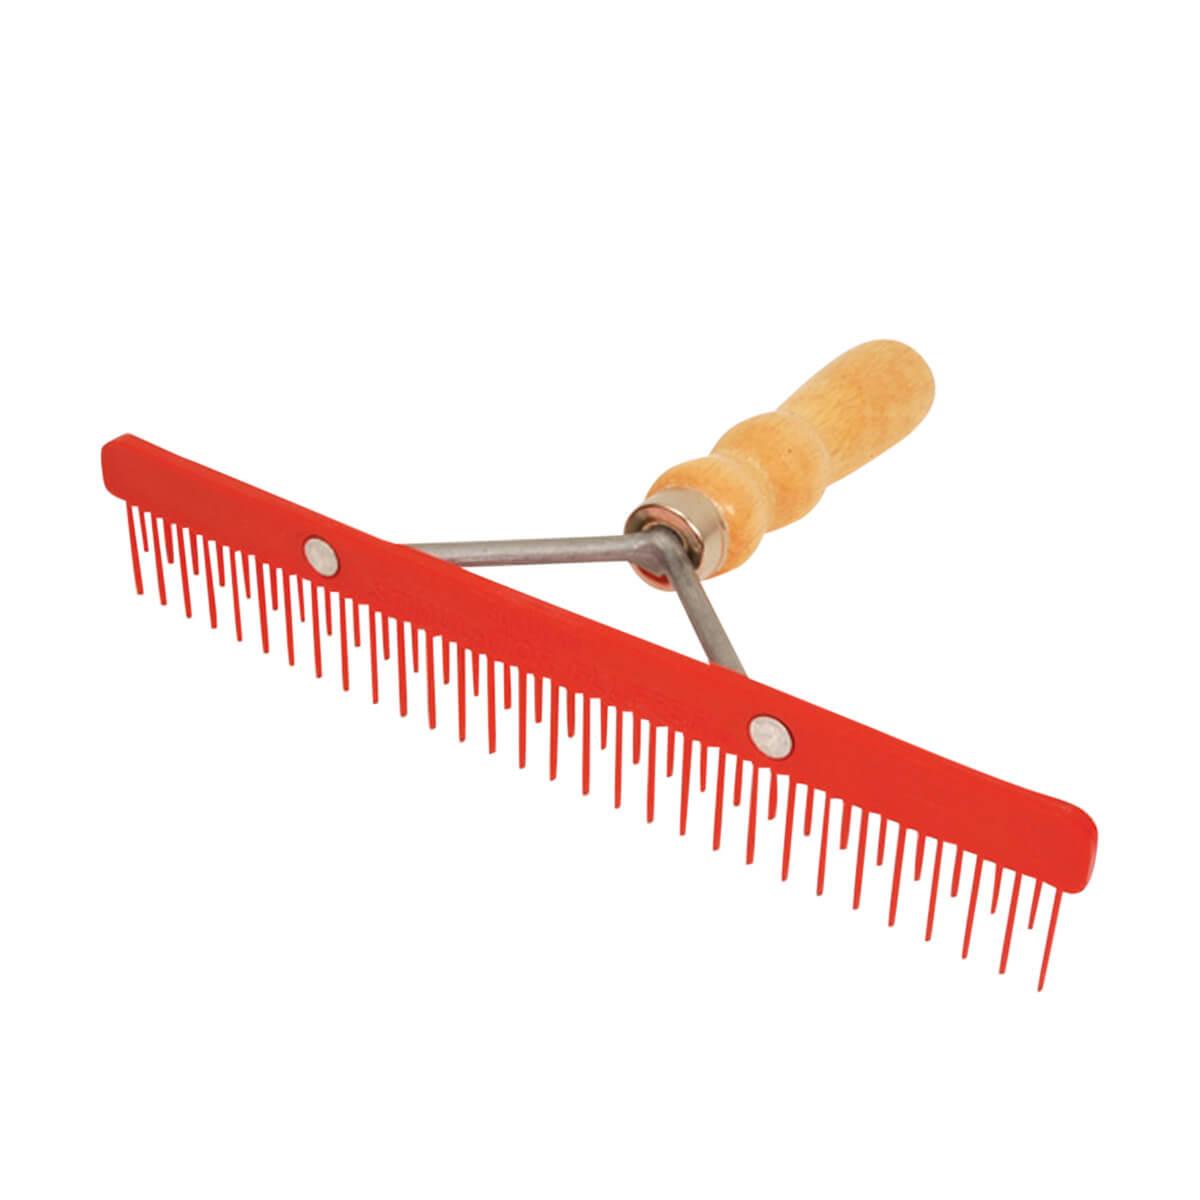 Sullivan's Stimulator Fluffer Comb wih Wooden Handle